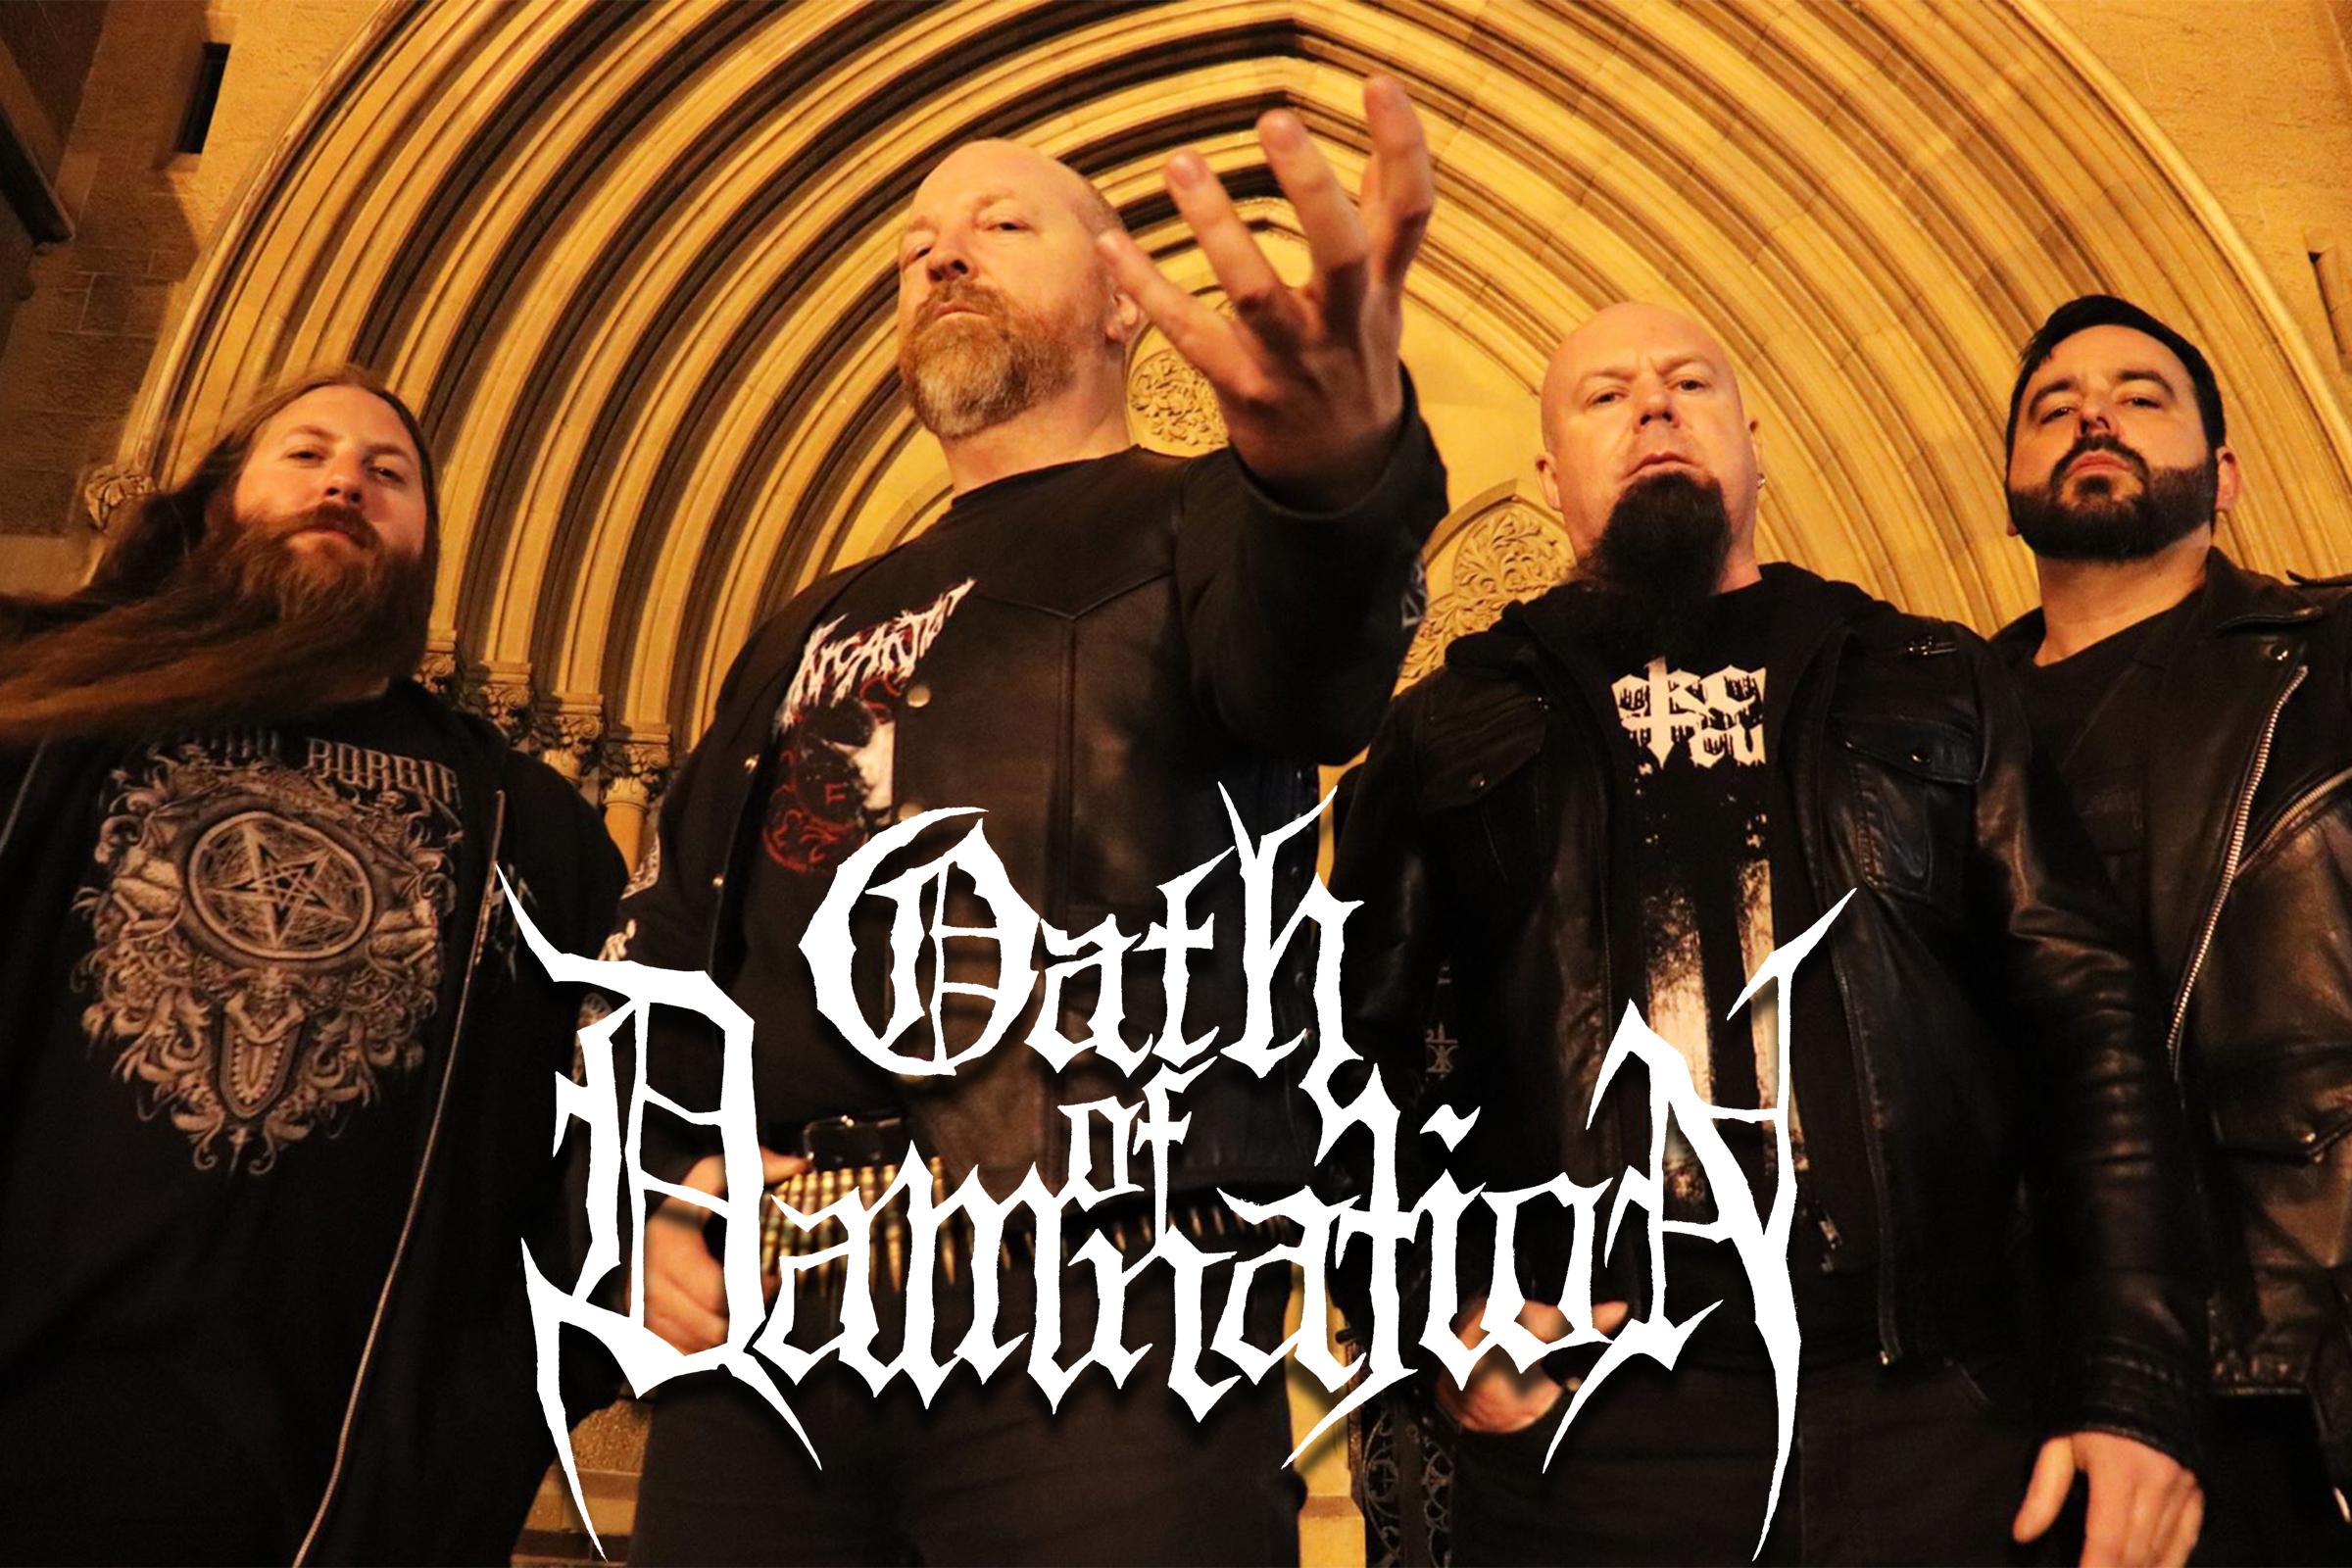 OATH OF DAMNATION